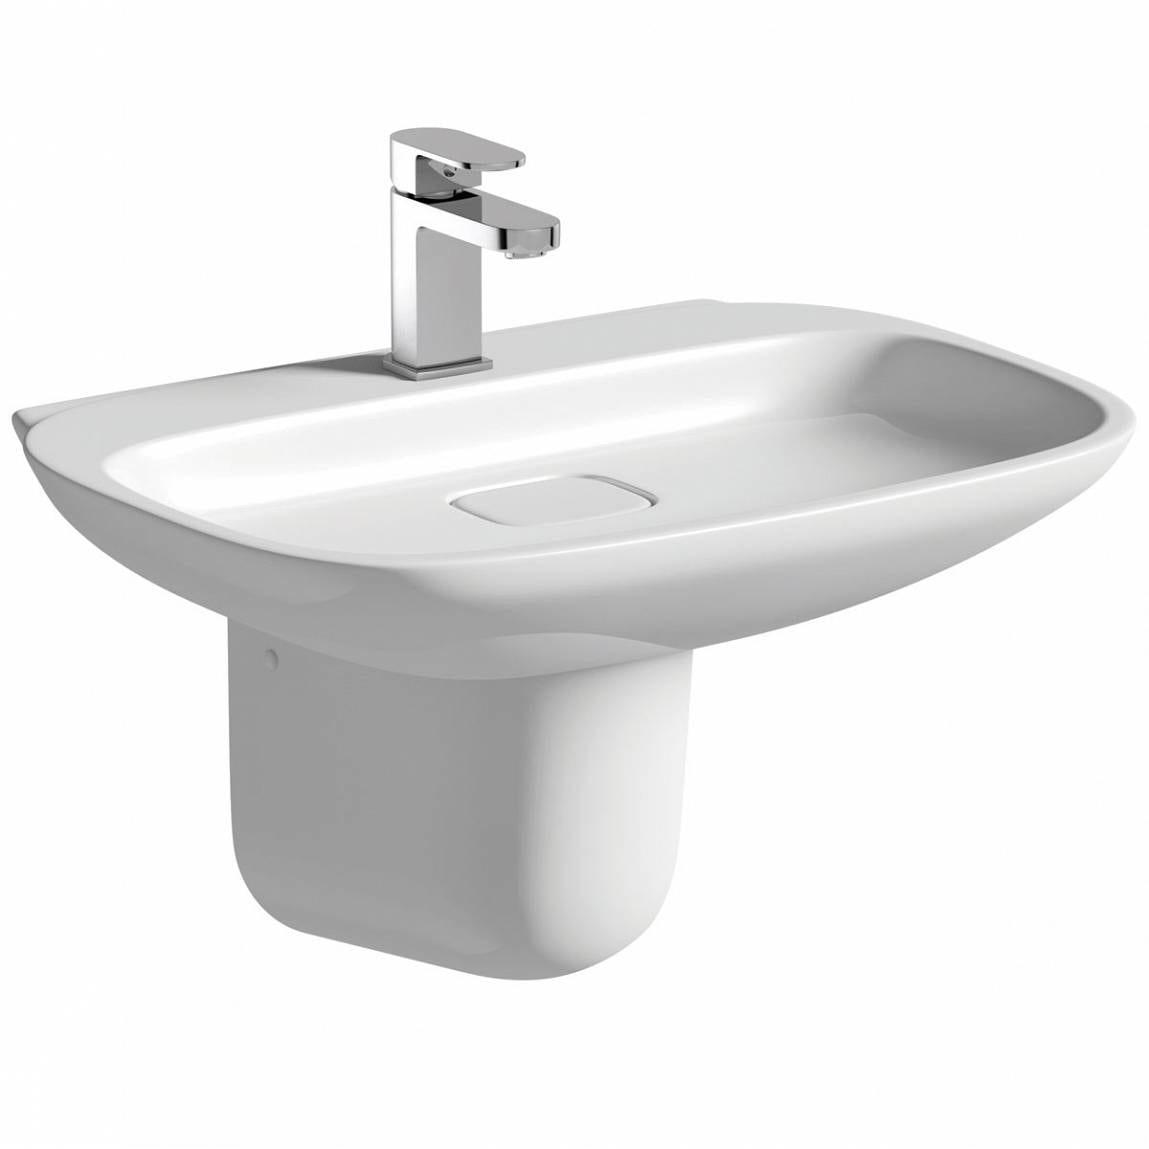 Mode Heath 1 tap hole semi pedestal basin 600mm with waste